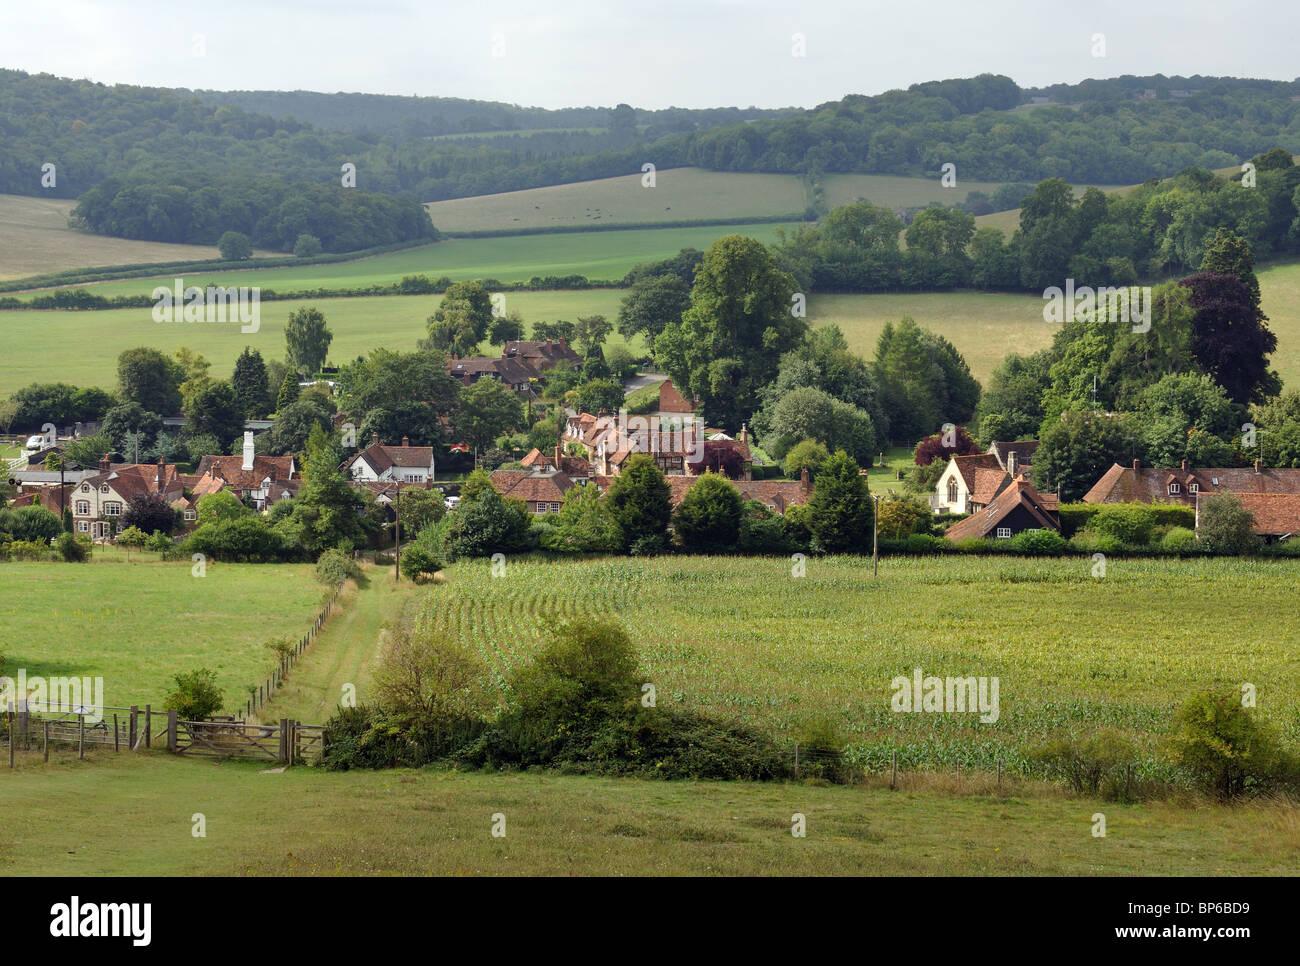 Turville village and Chiltern landscape in summer, Buckinghamshire, England, UK - Stock Image